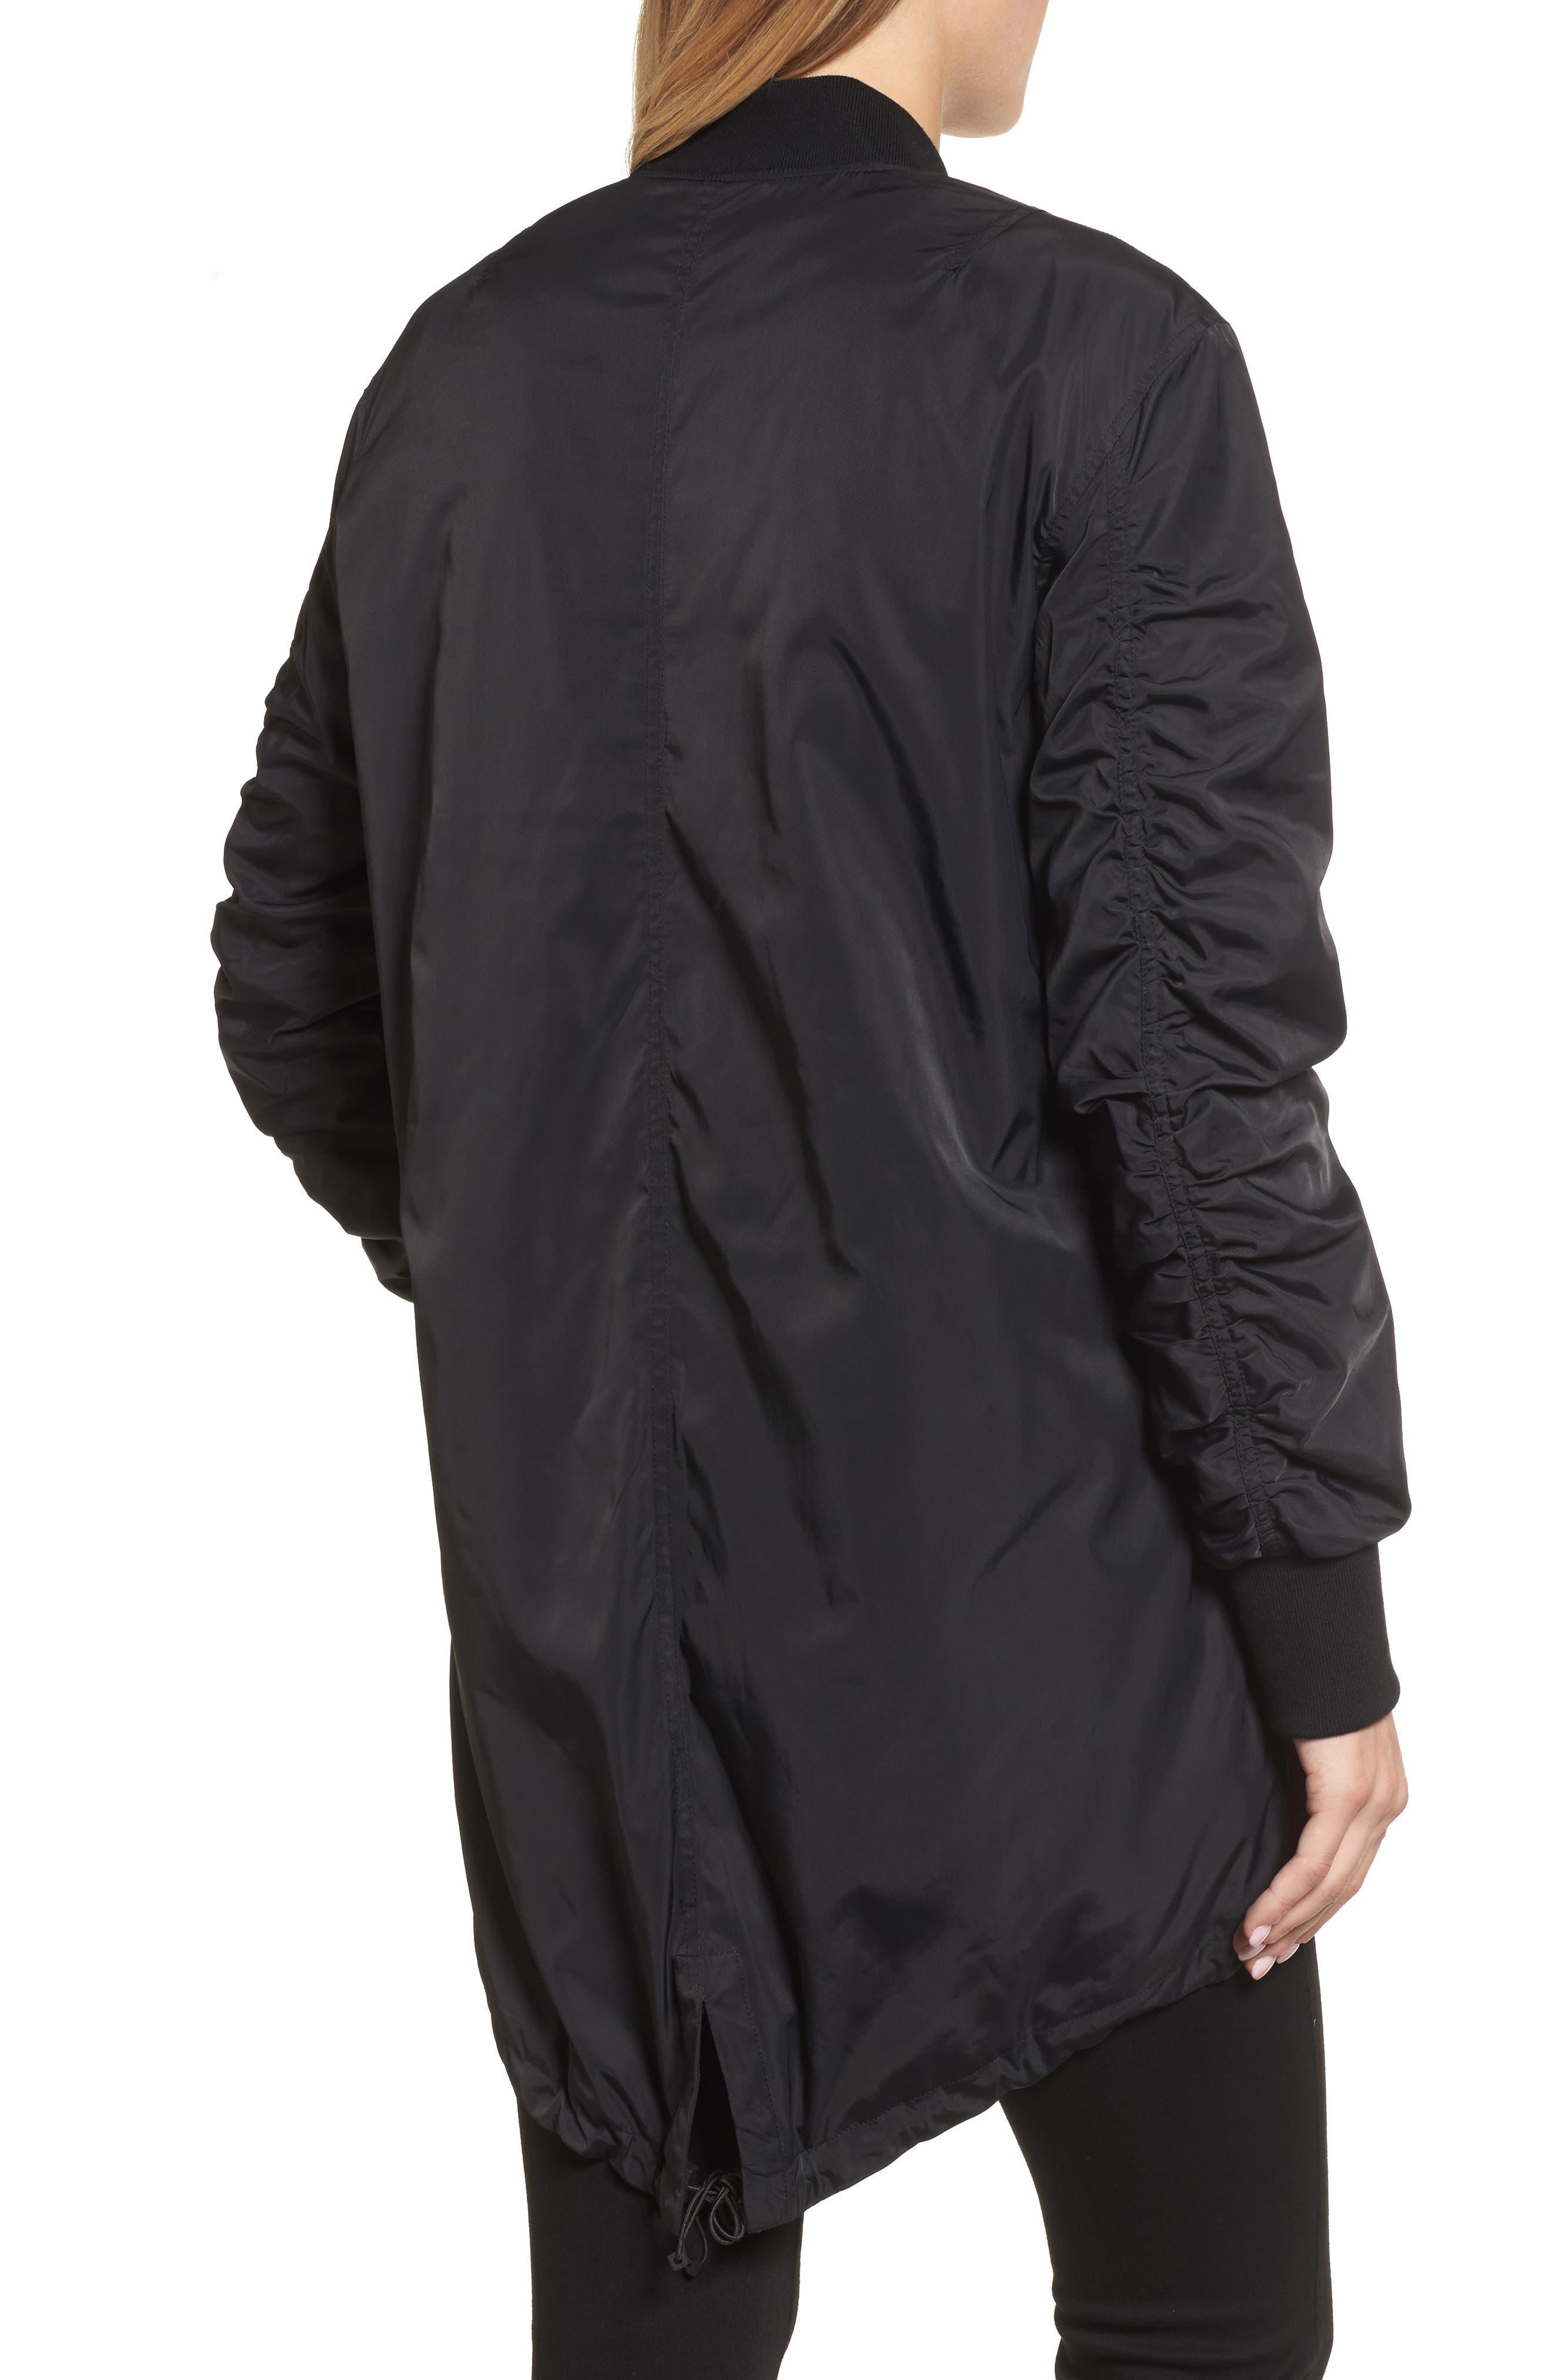 Bomber Anorak Jacket,                             Alternate thumbnail 2, color,                             Black